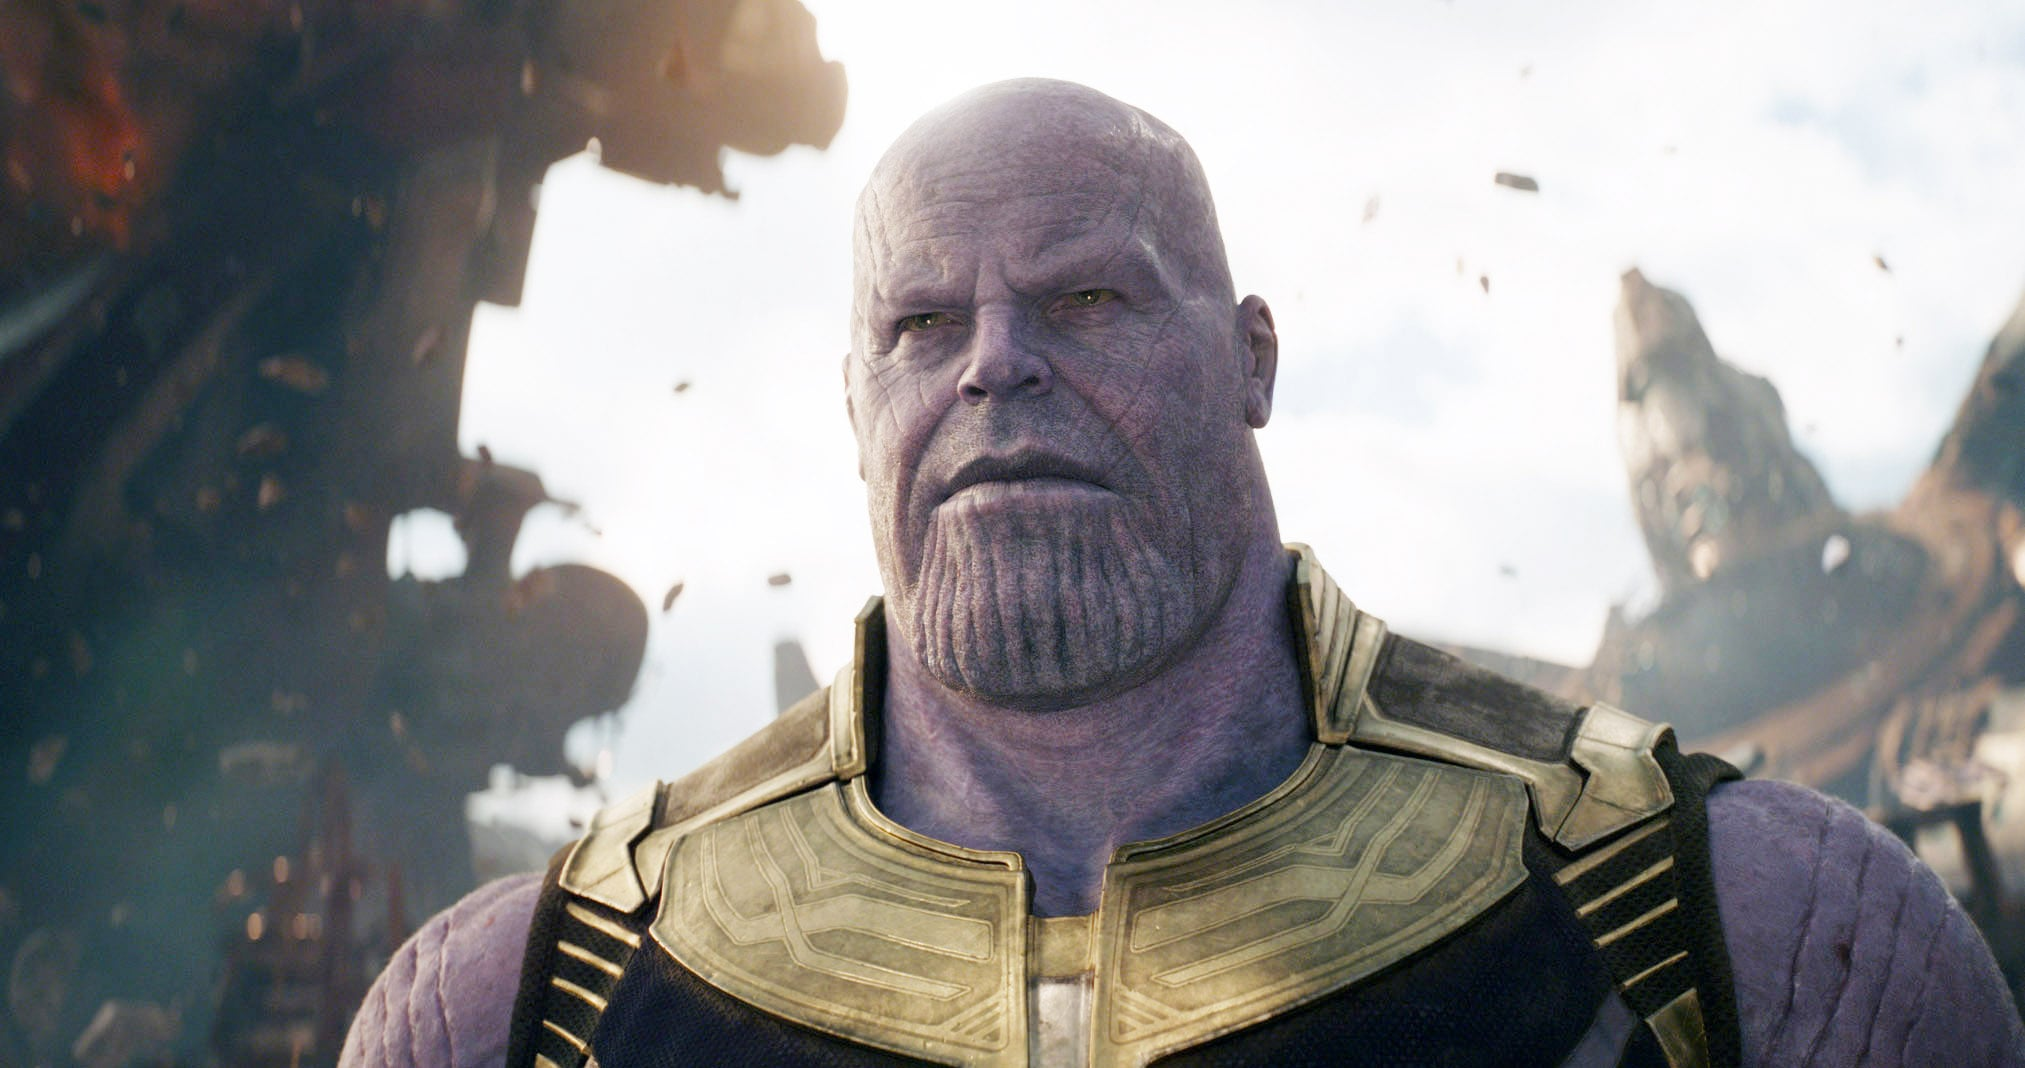 AVENGERS: INFINITY WAR, Josh Brolin as Thanos, 2018.  Marvel/  Walt Disney Studios Motion Pictures /Courtesy Everett Collection